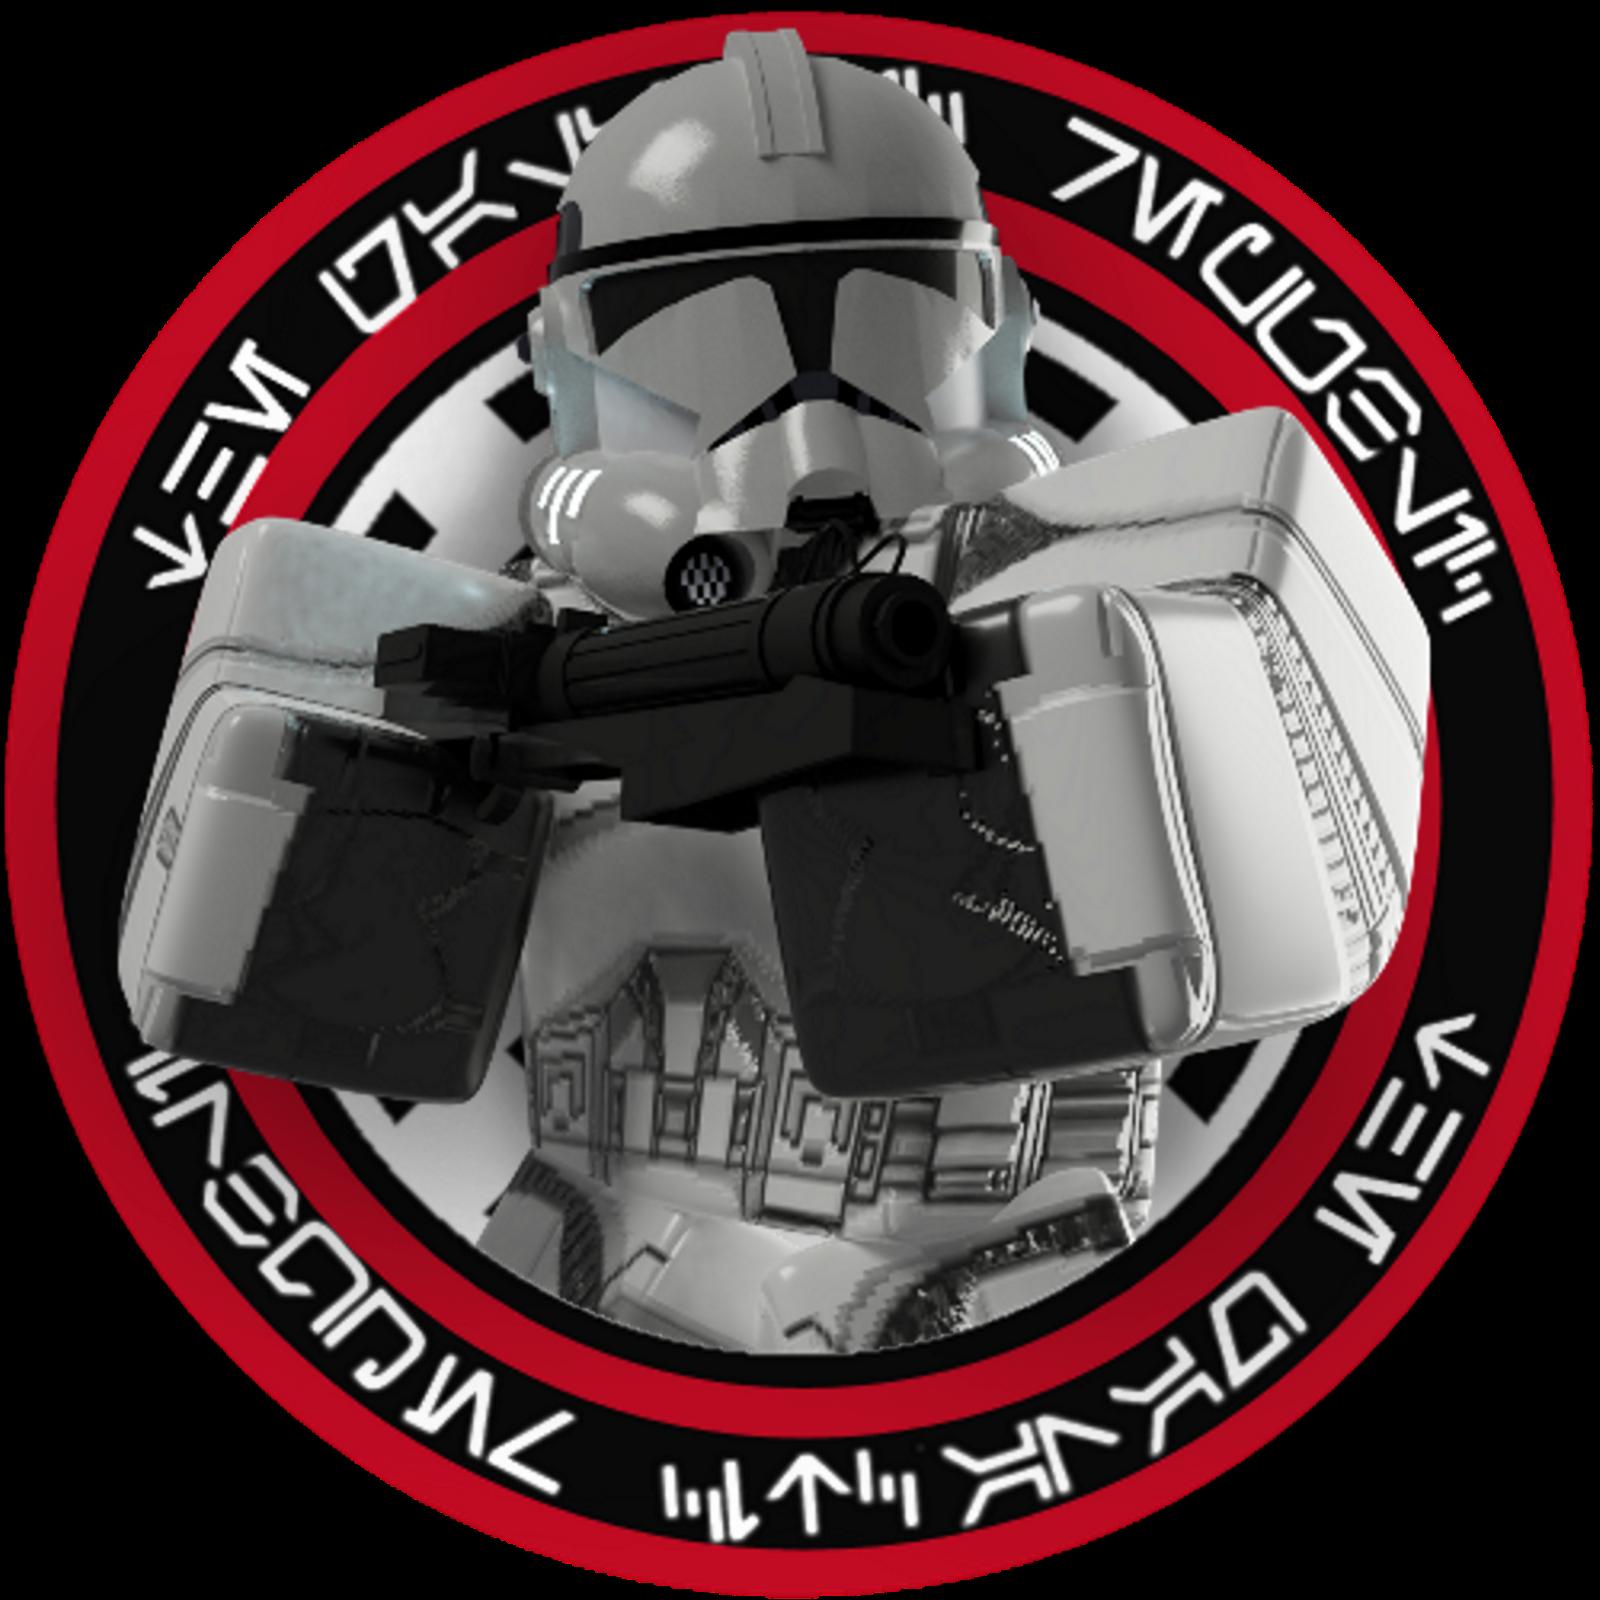 Combat Applications Group Roblox The Galactic Republic Roblox Wikia Fandom